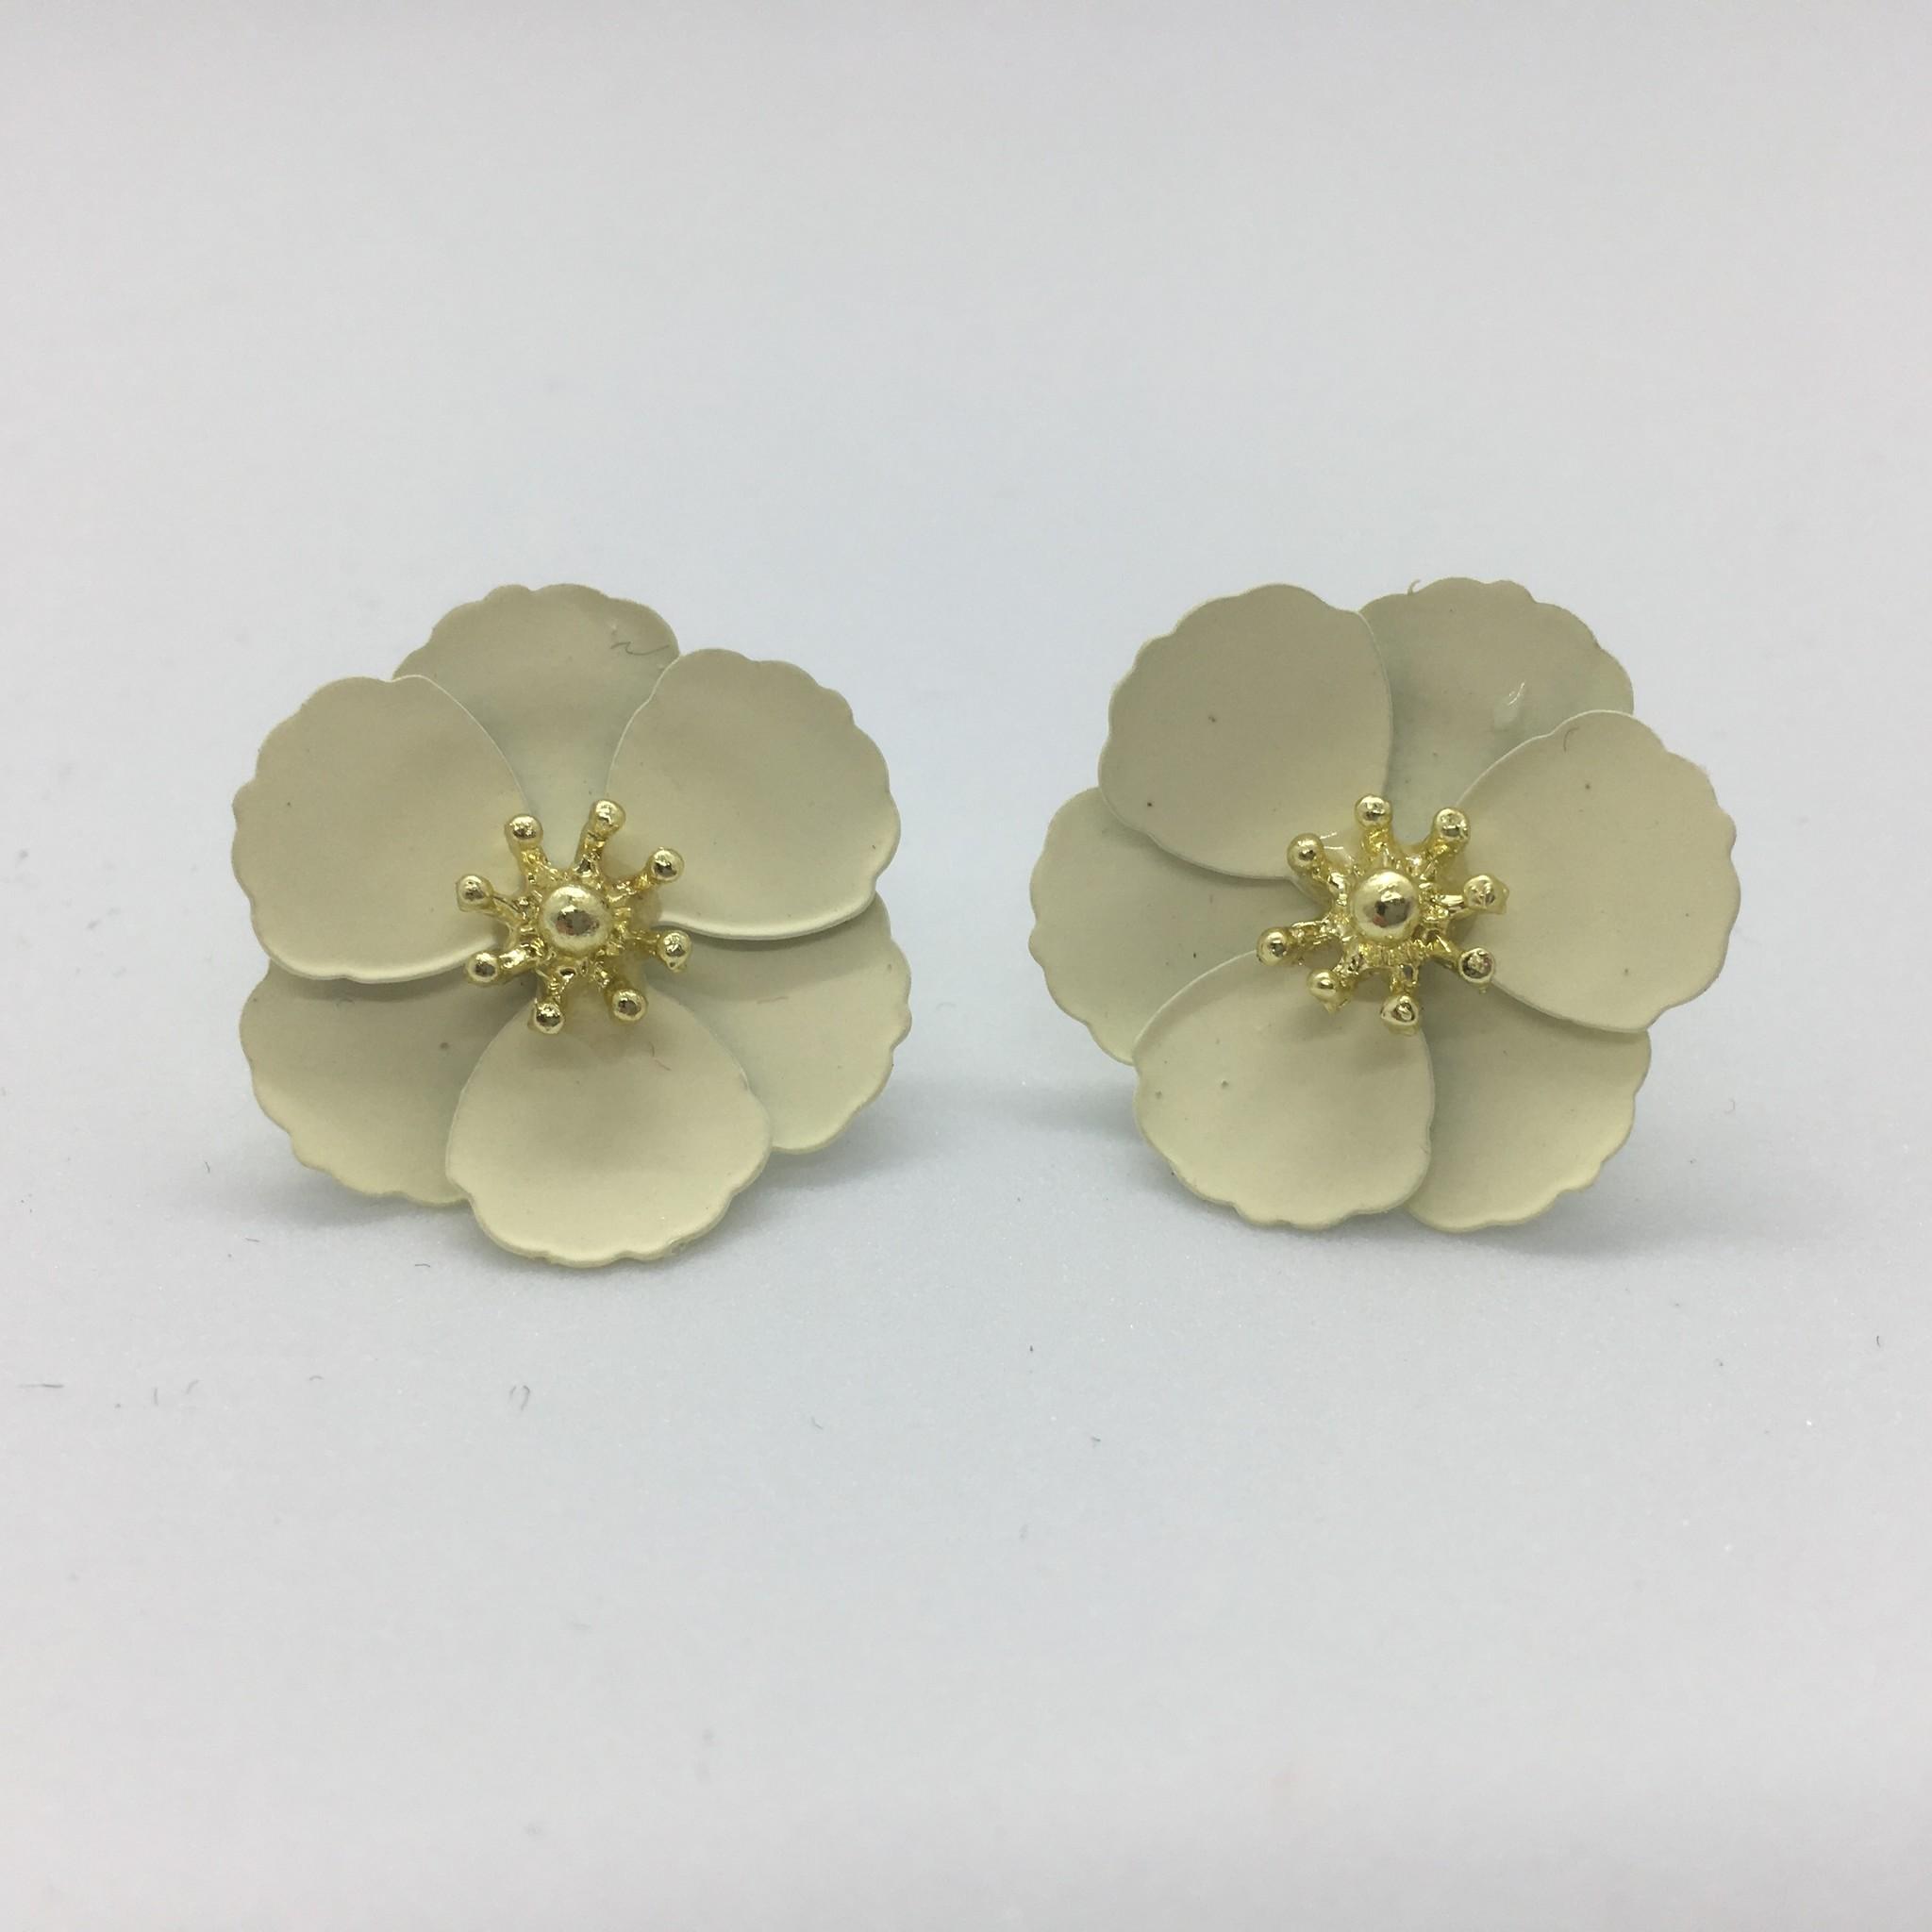 Sooley Designs Small Jasmine Flower Earrings